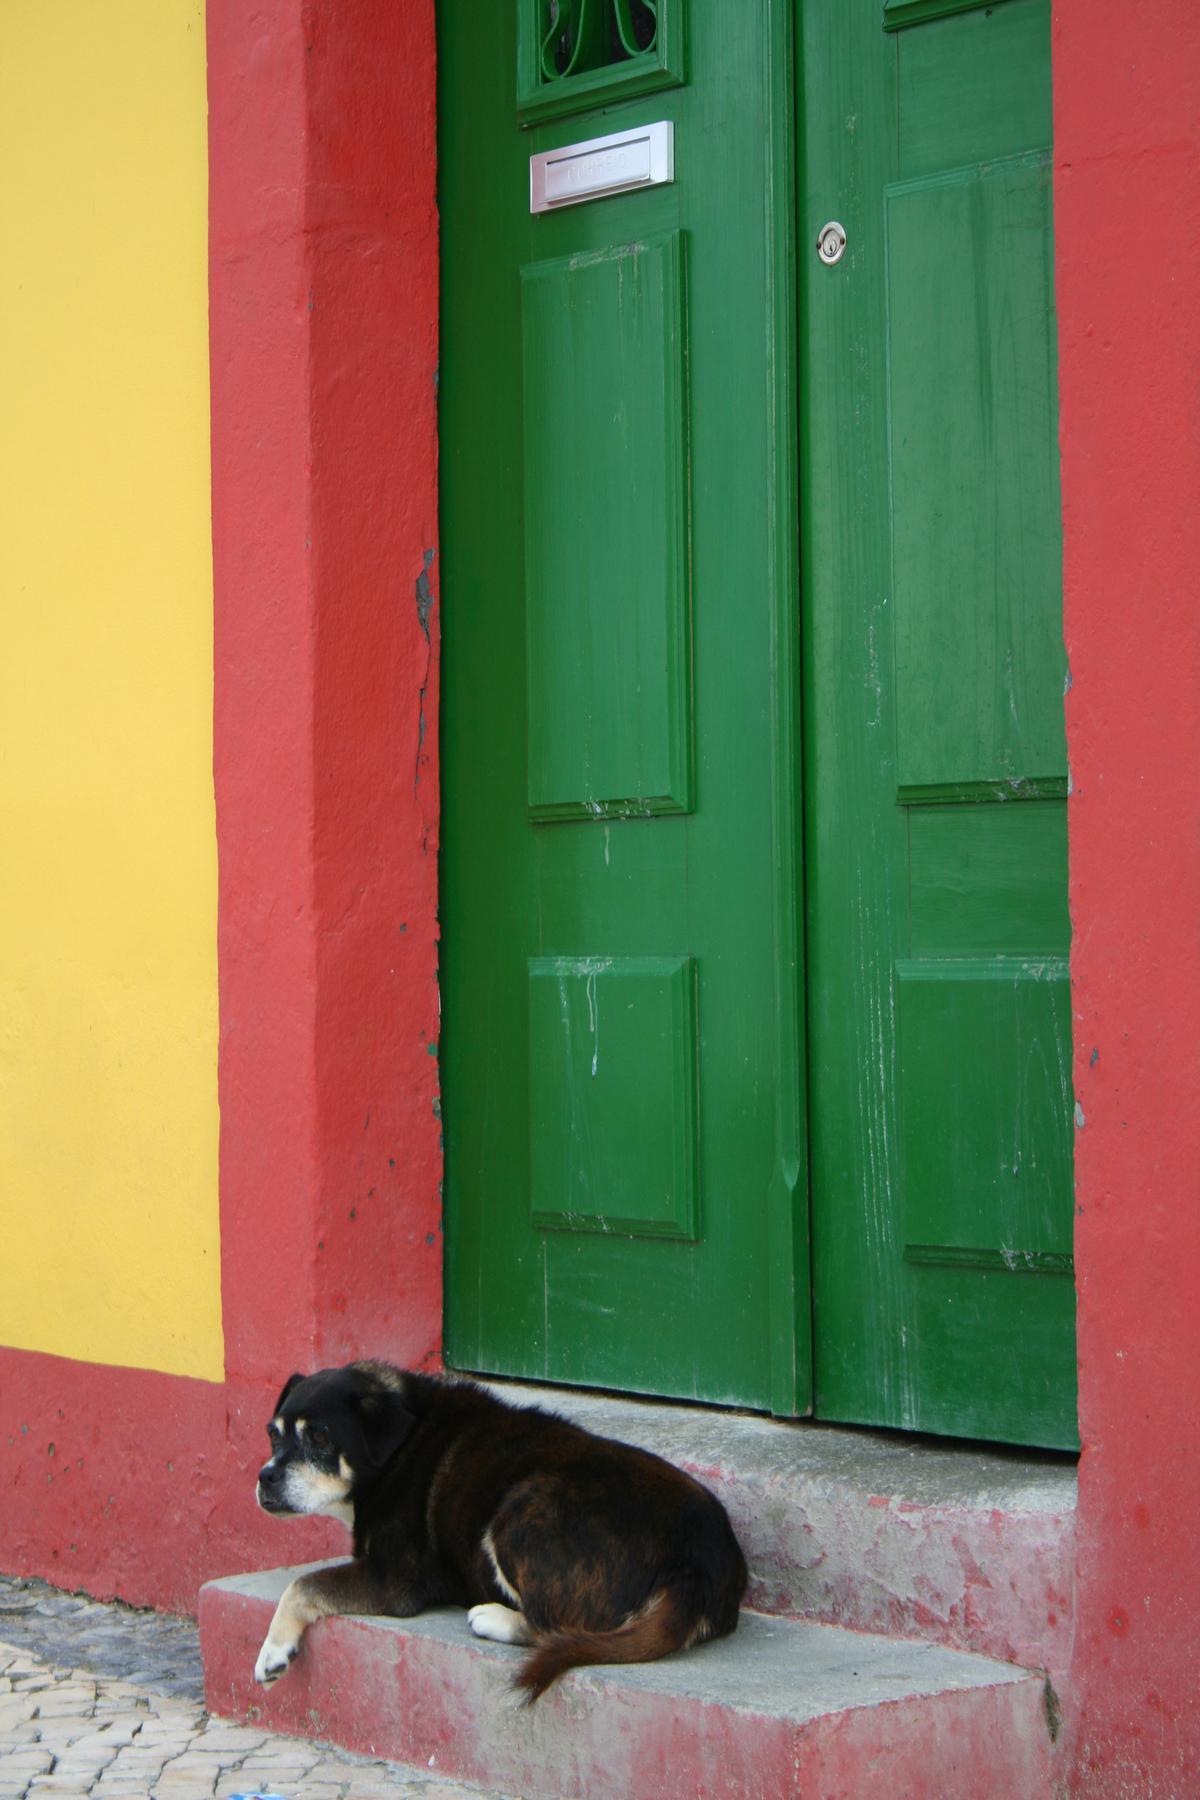 Dog at Colorful Doorway in Ethiopia.